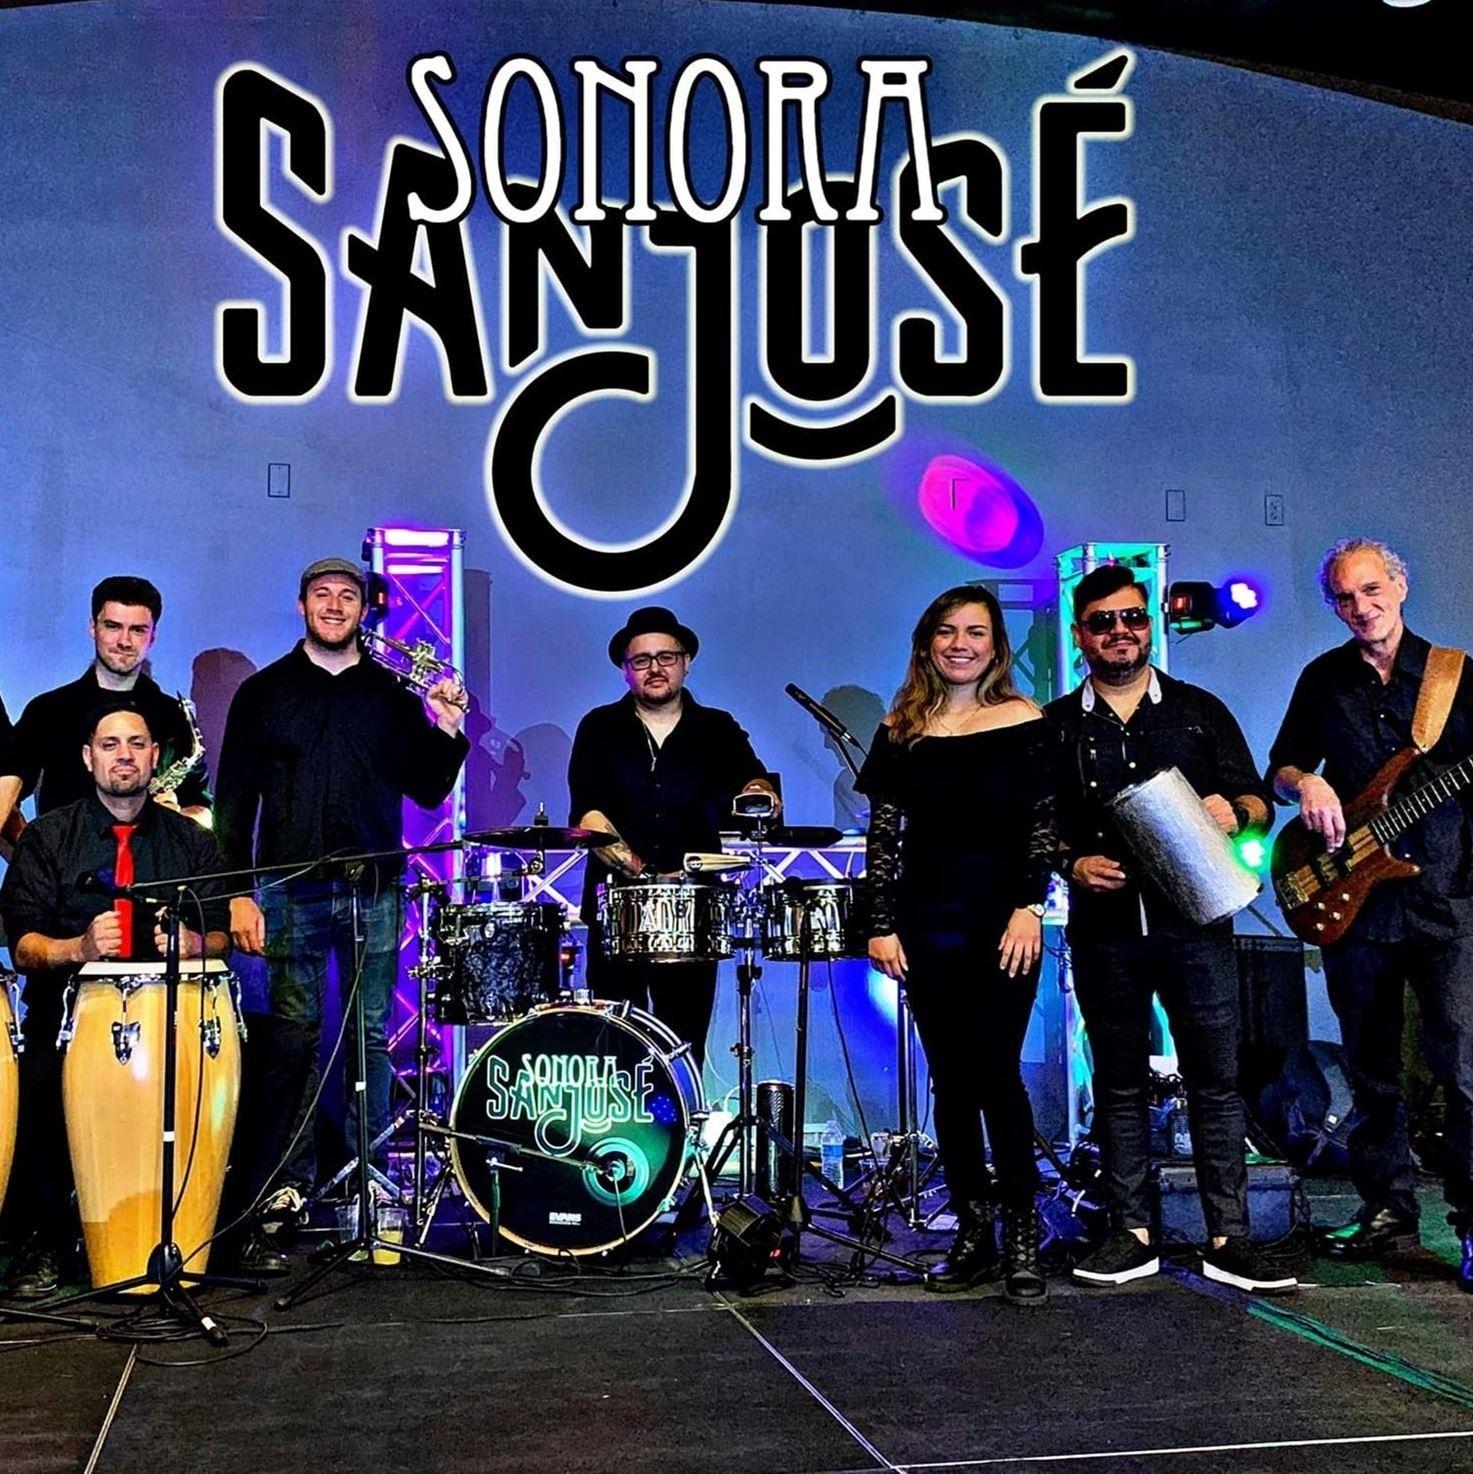 Sonora San Jose